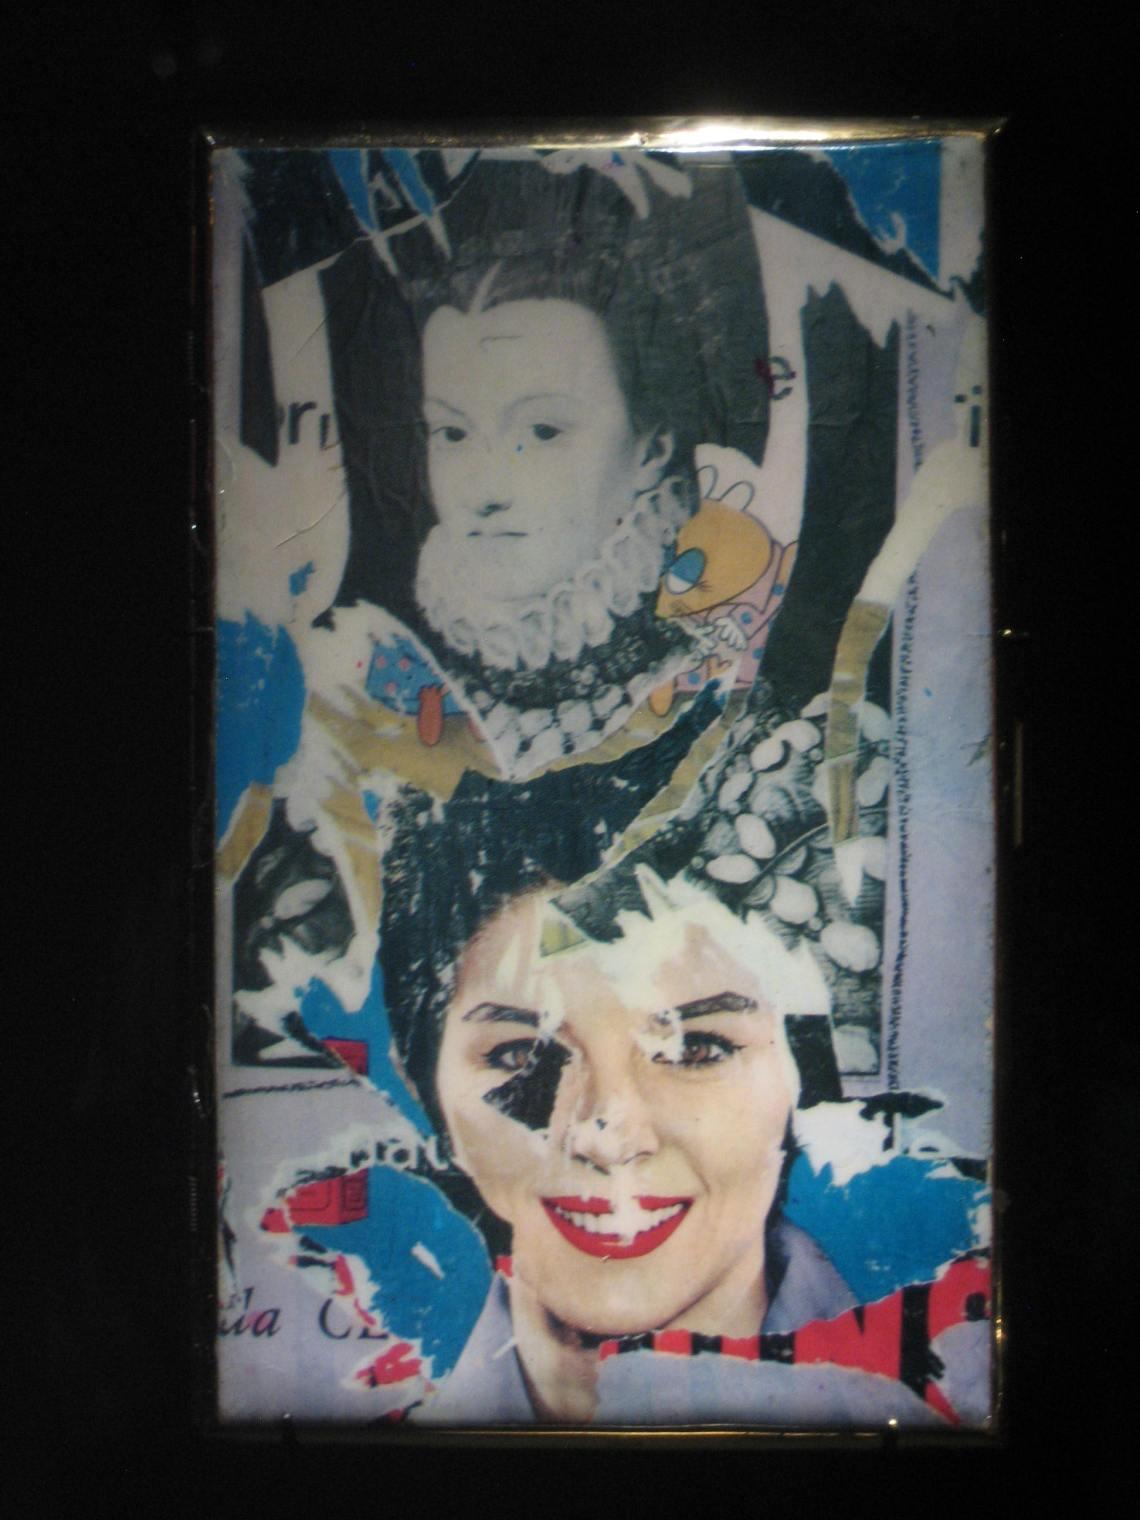 Mimmo Rotella, sigarettenhouder, 1985. Collectie Diane Venet. Foto Esther Doornbusch, juni 2018©